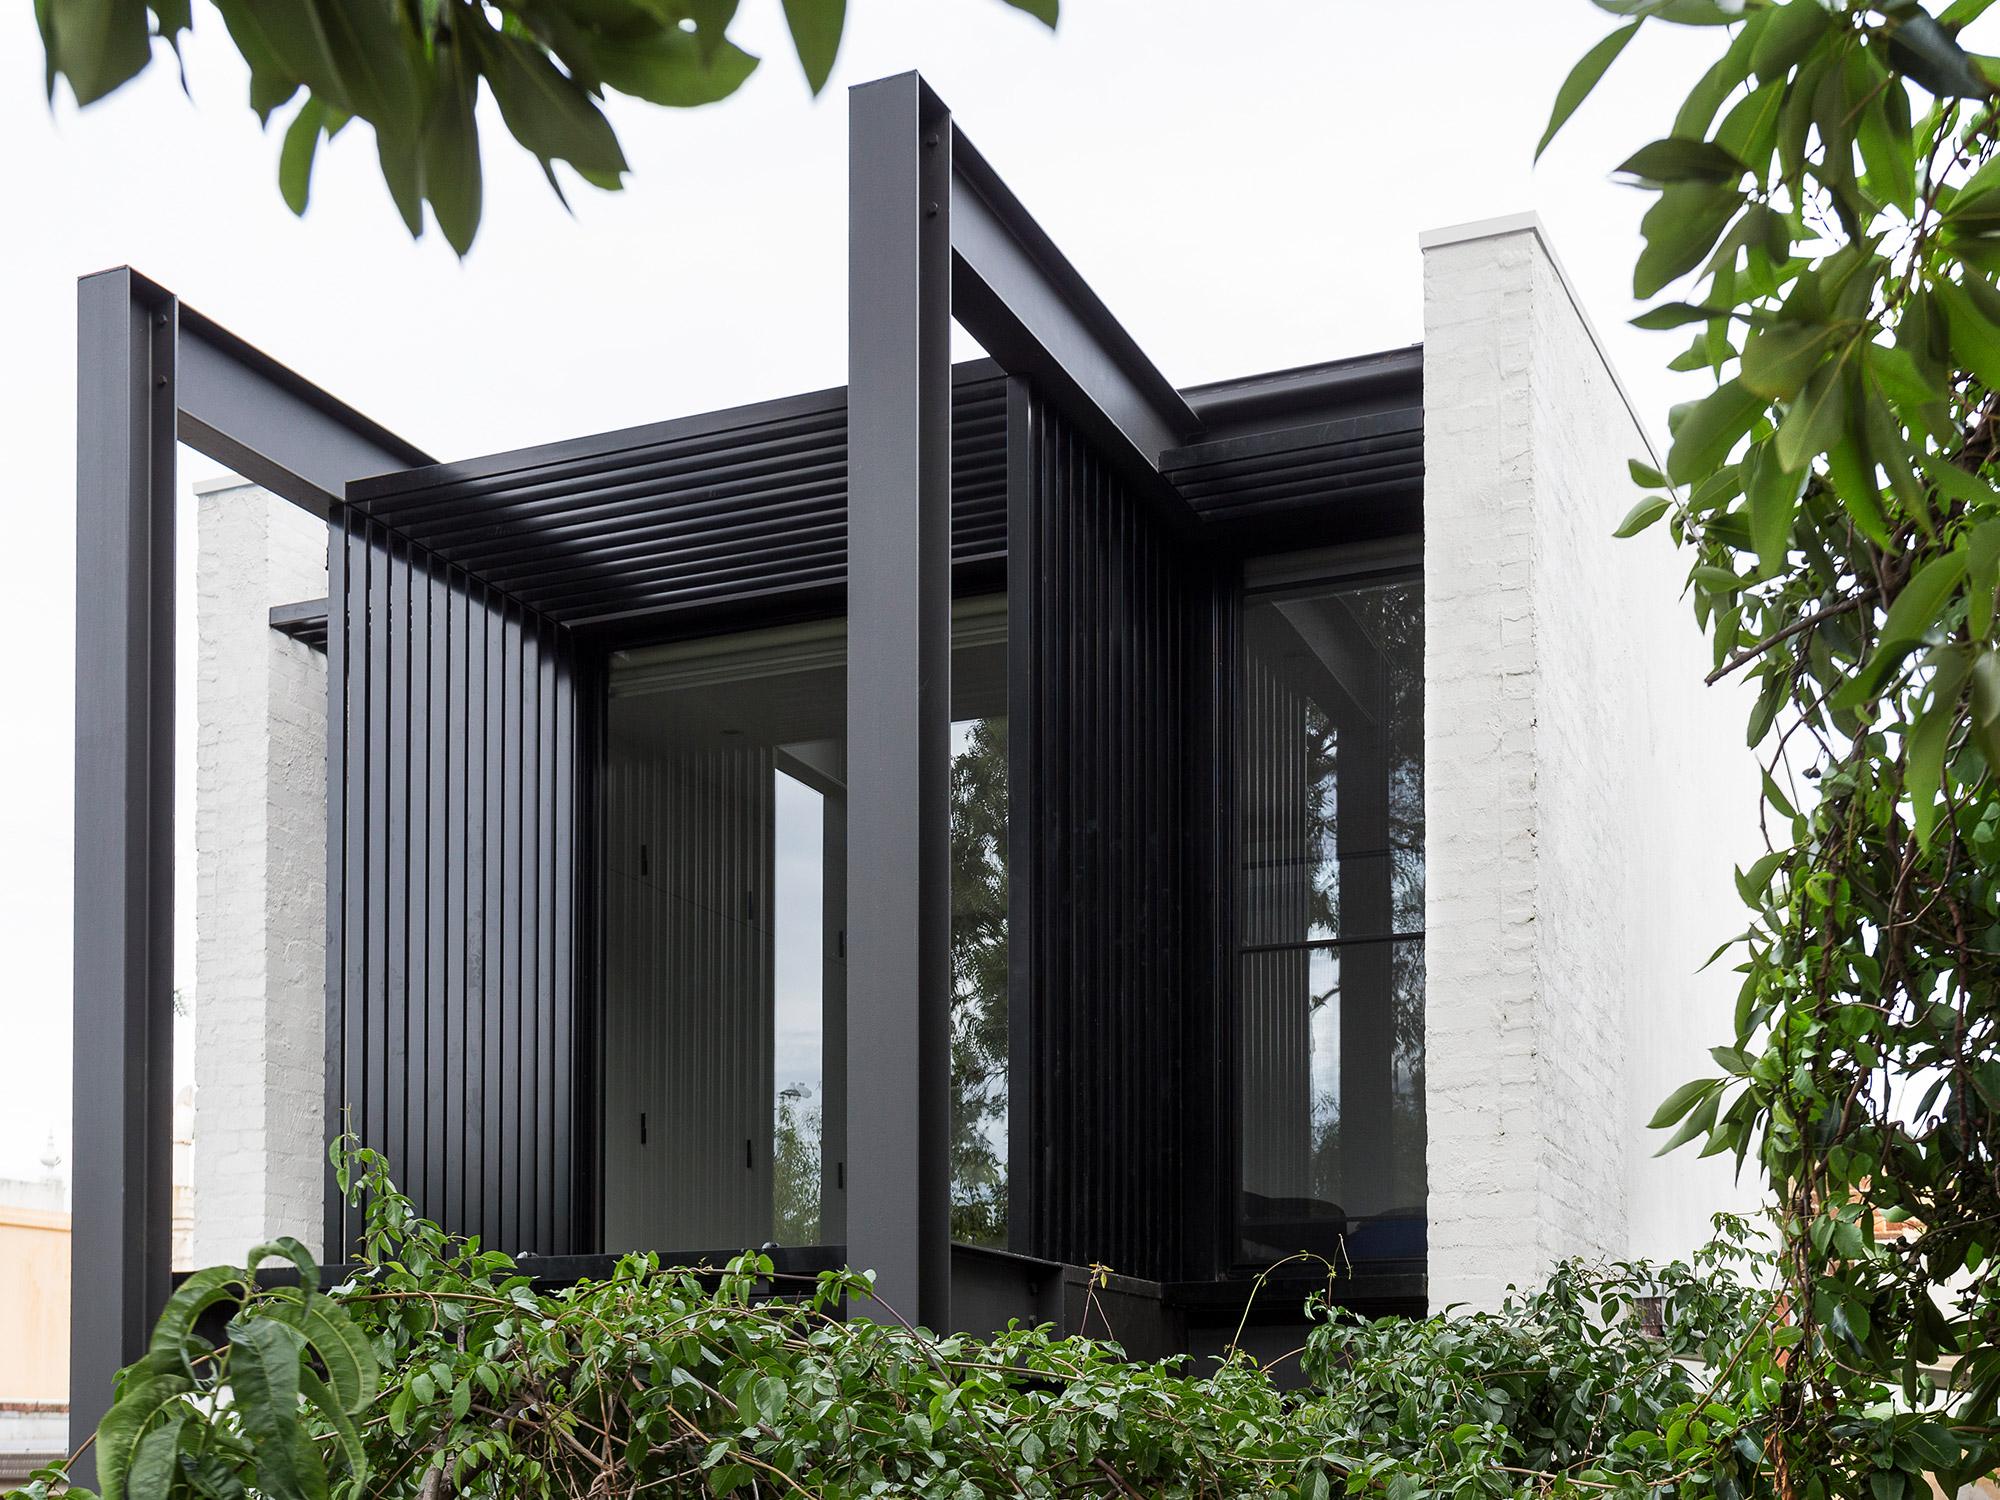 01-carlton-house.jpg